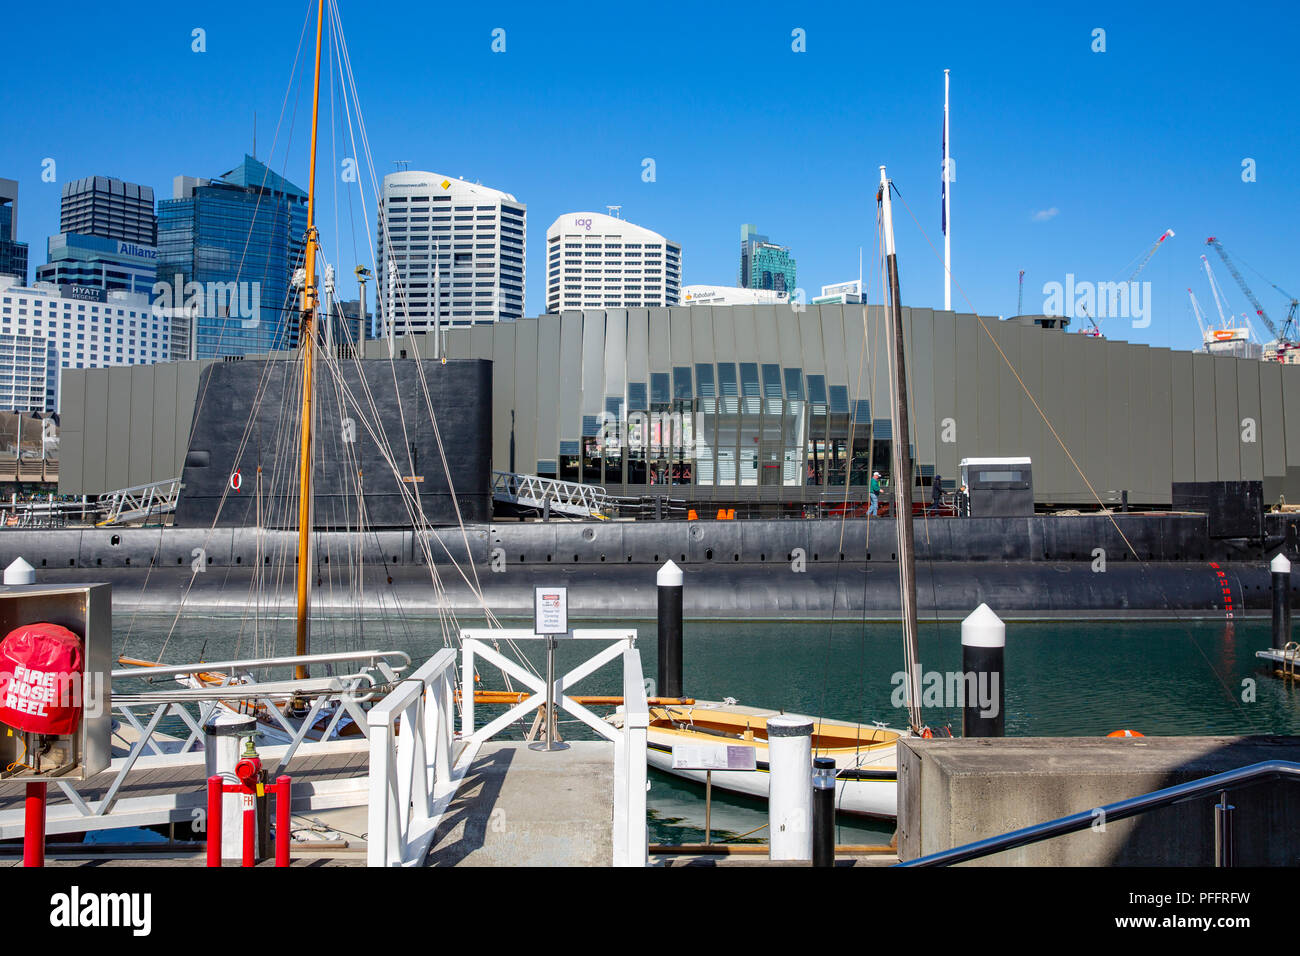 Submarine HMAS Onslow at the Australian national maritime museum in Darling Harbour,Sydney,Australia - Stock Image